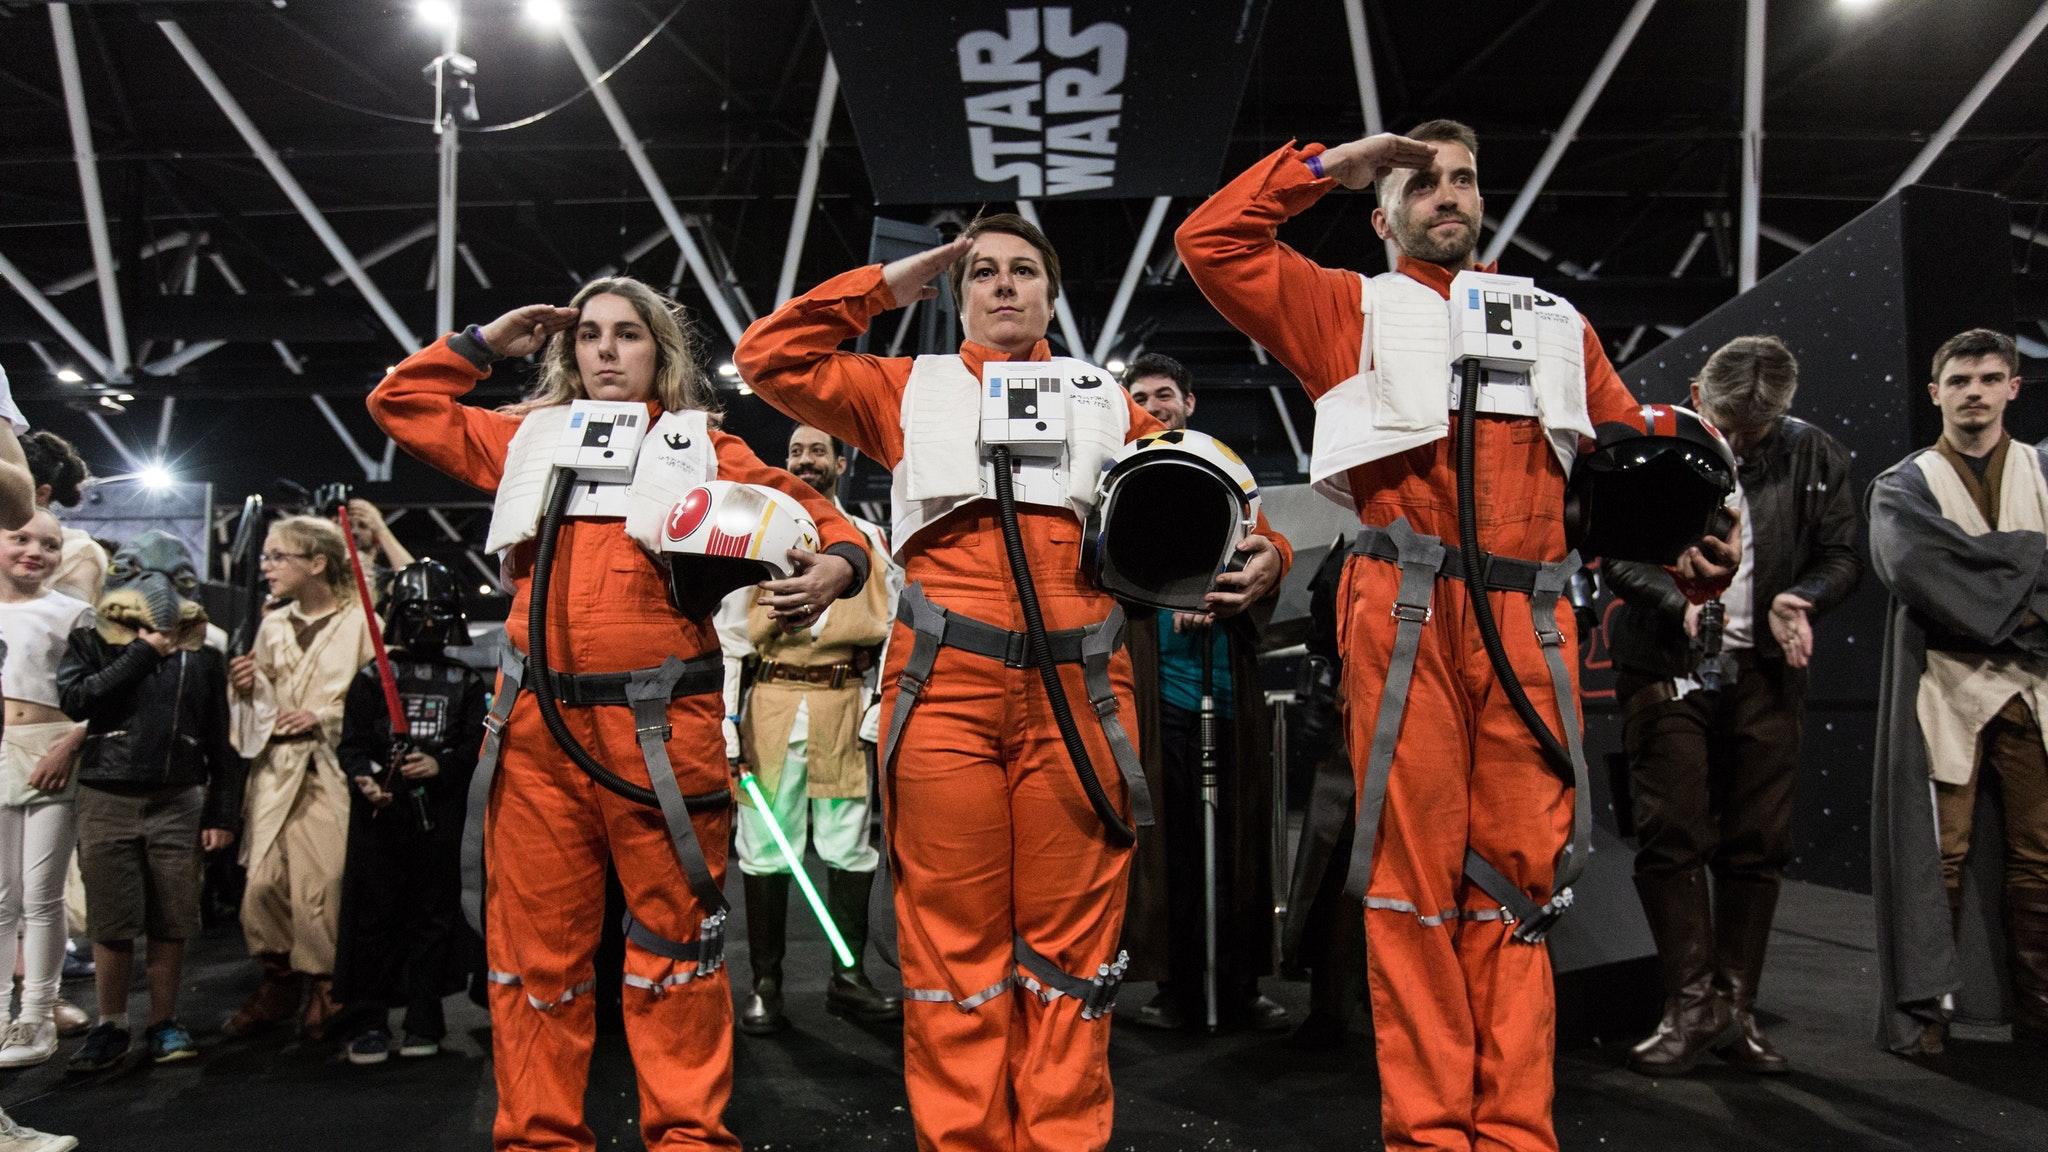 star wars cosplayers